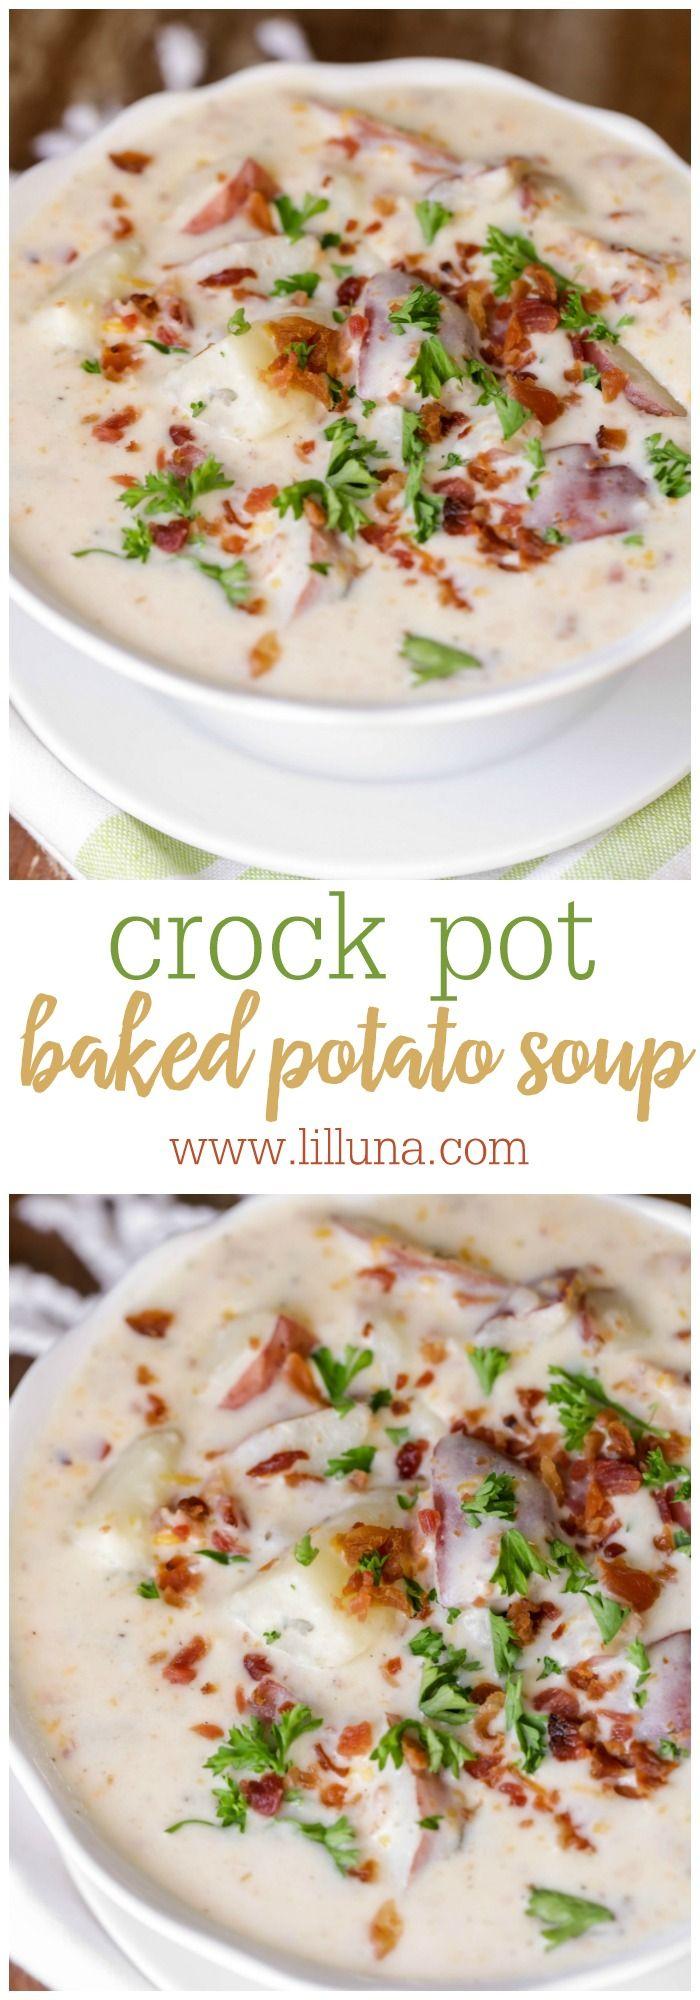 72968 best Bake, Cook, Eat! images on Pinterest | Cooking food ...